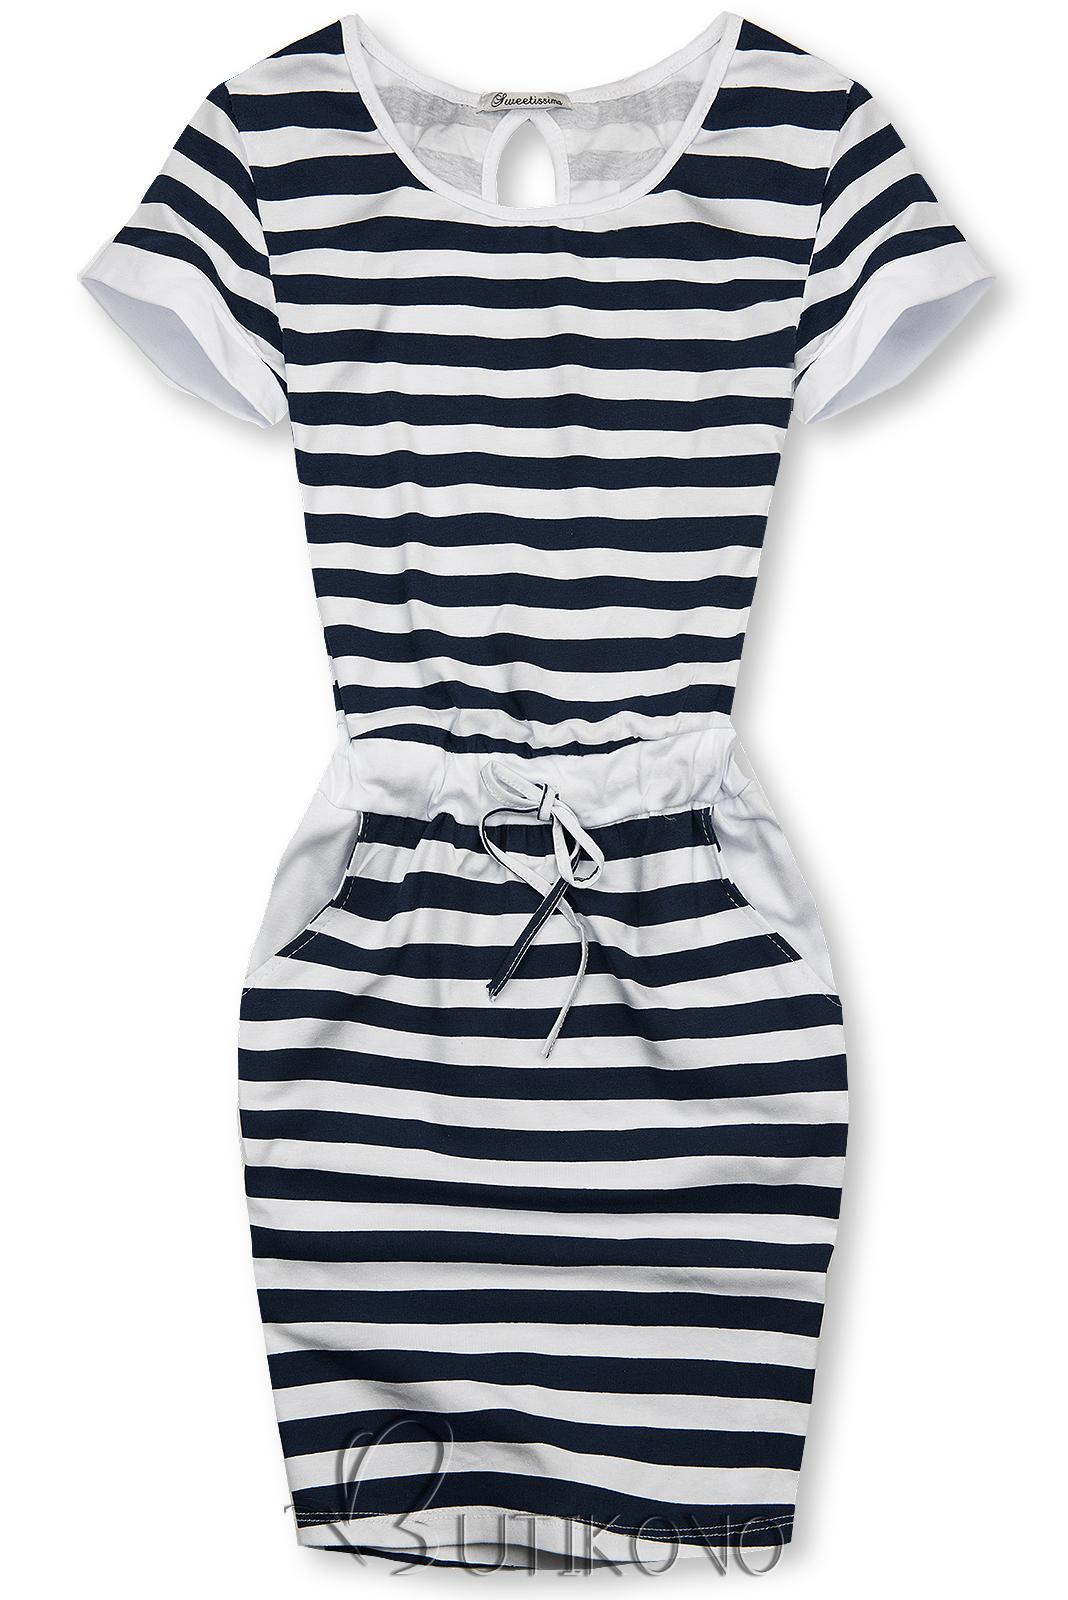 Modro-biele pruhované šaty I.